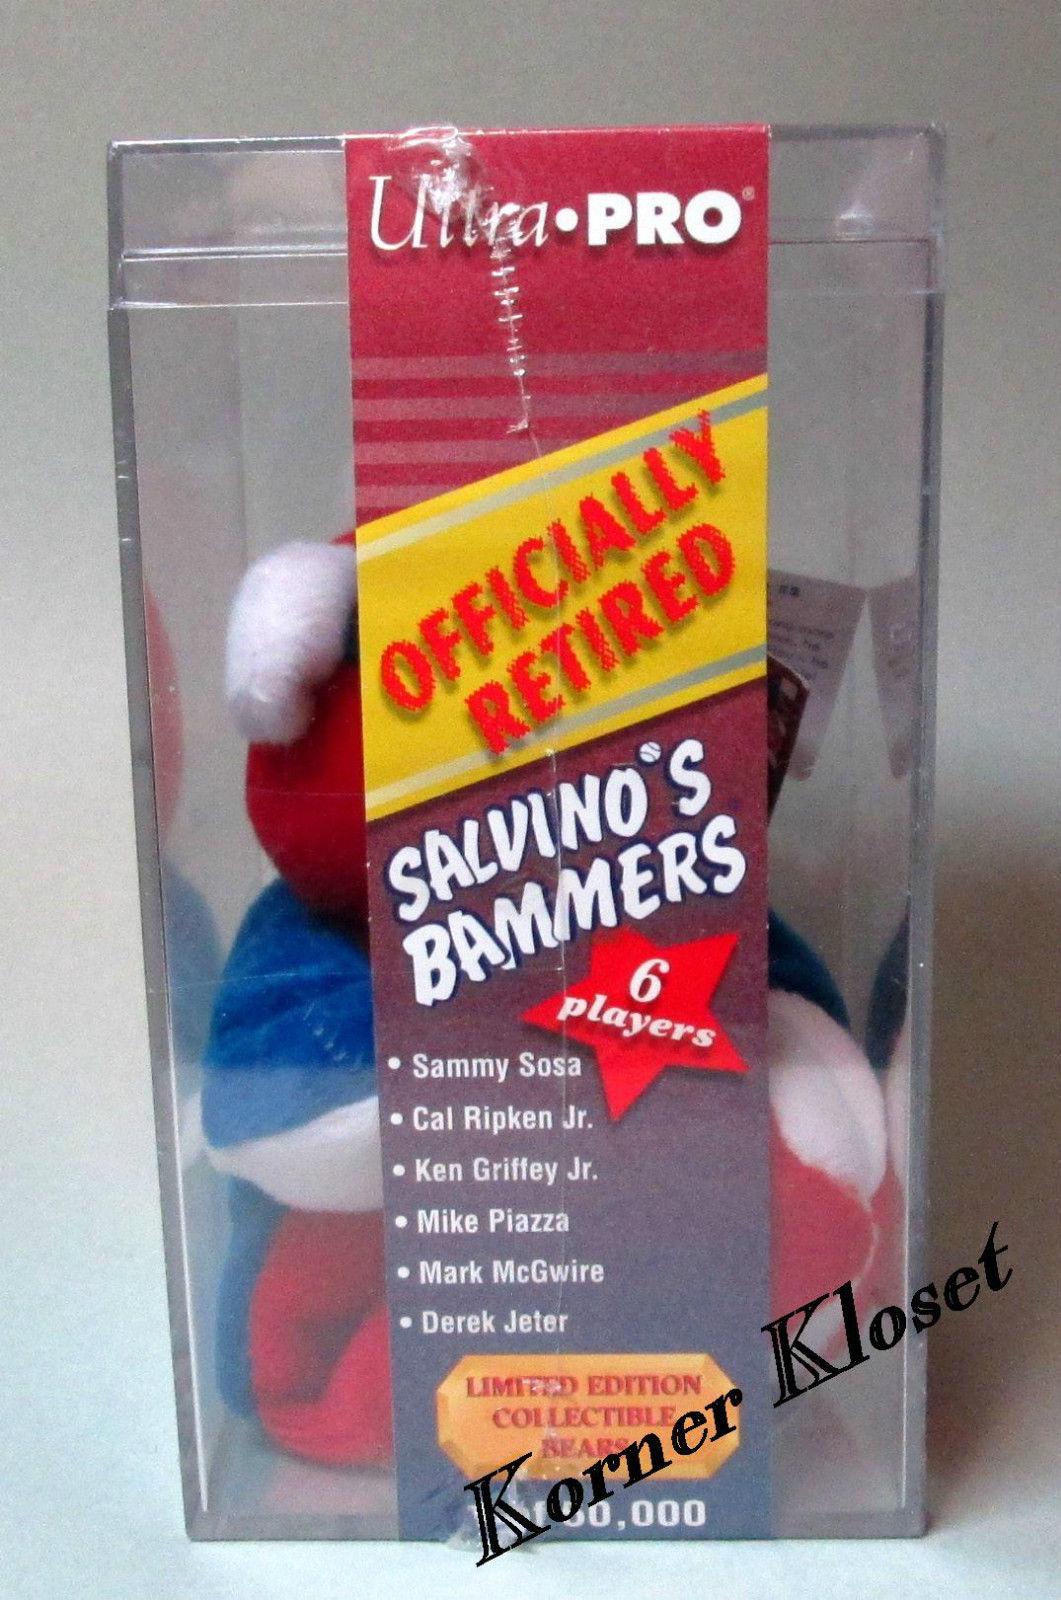 Derek Jeter Ultra-Pro Limited Edition Salvino's Bammers Plush Bear - MLB - NIB